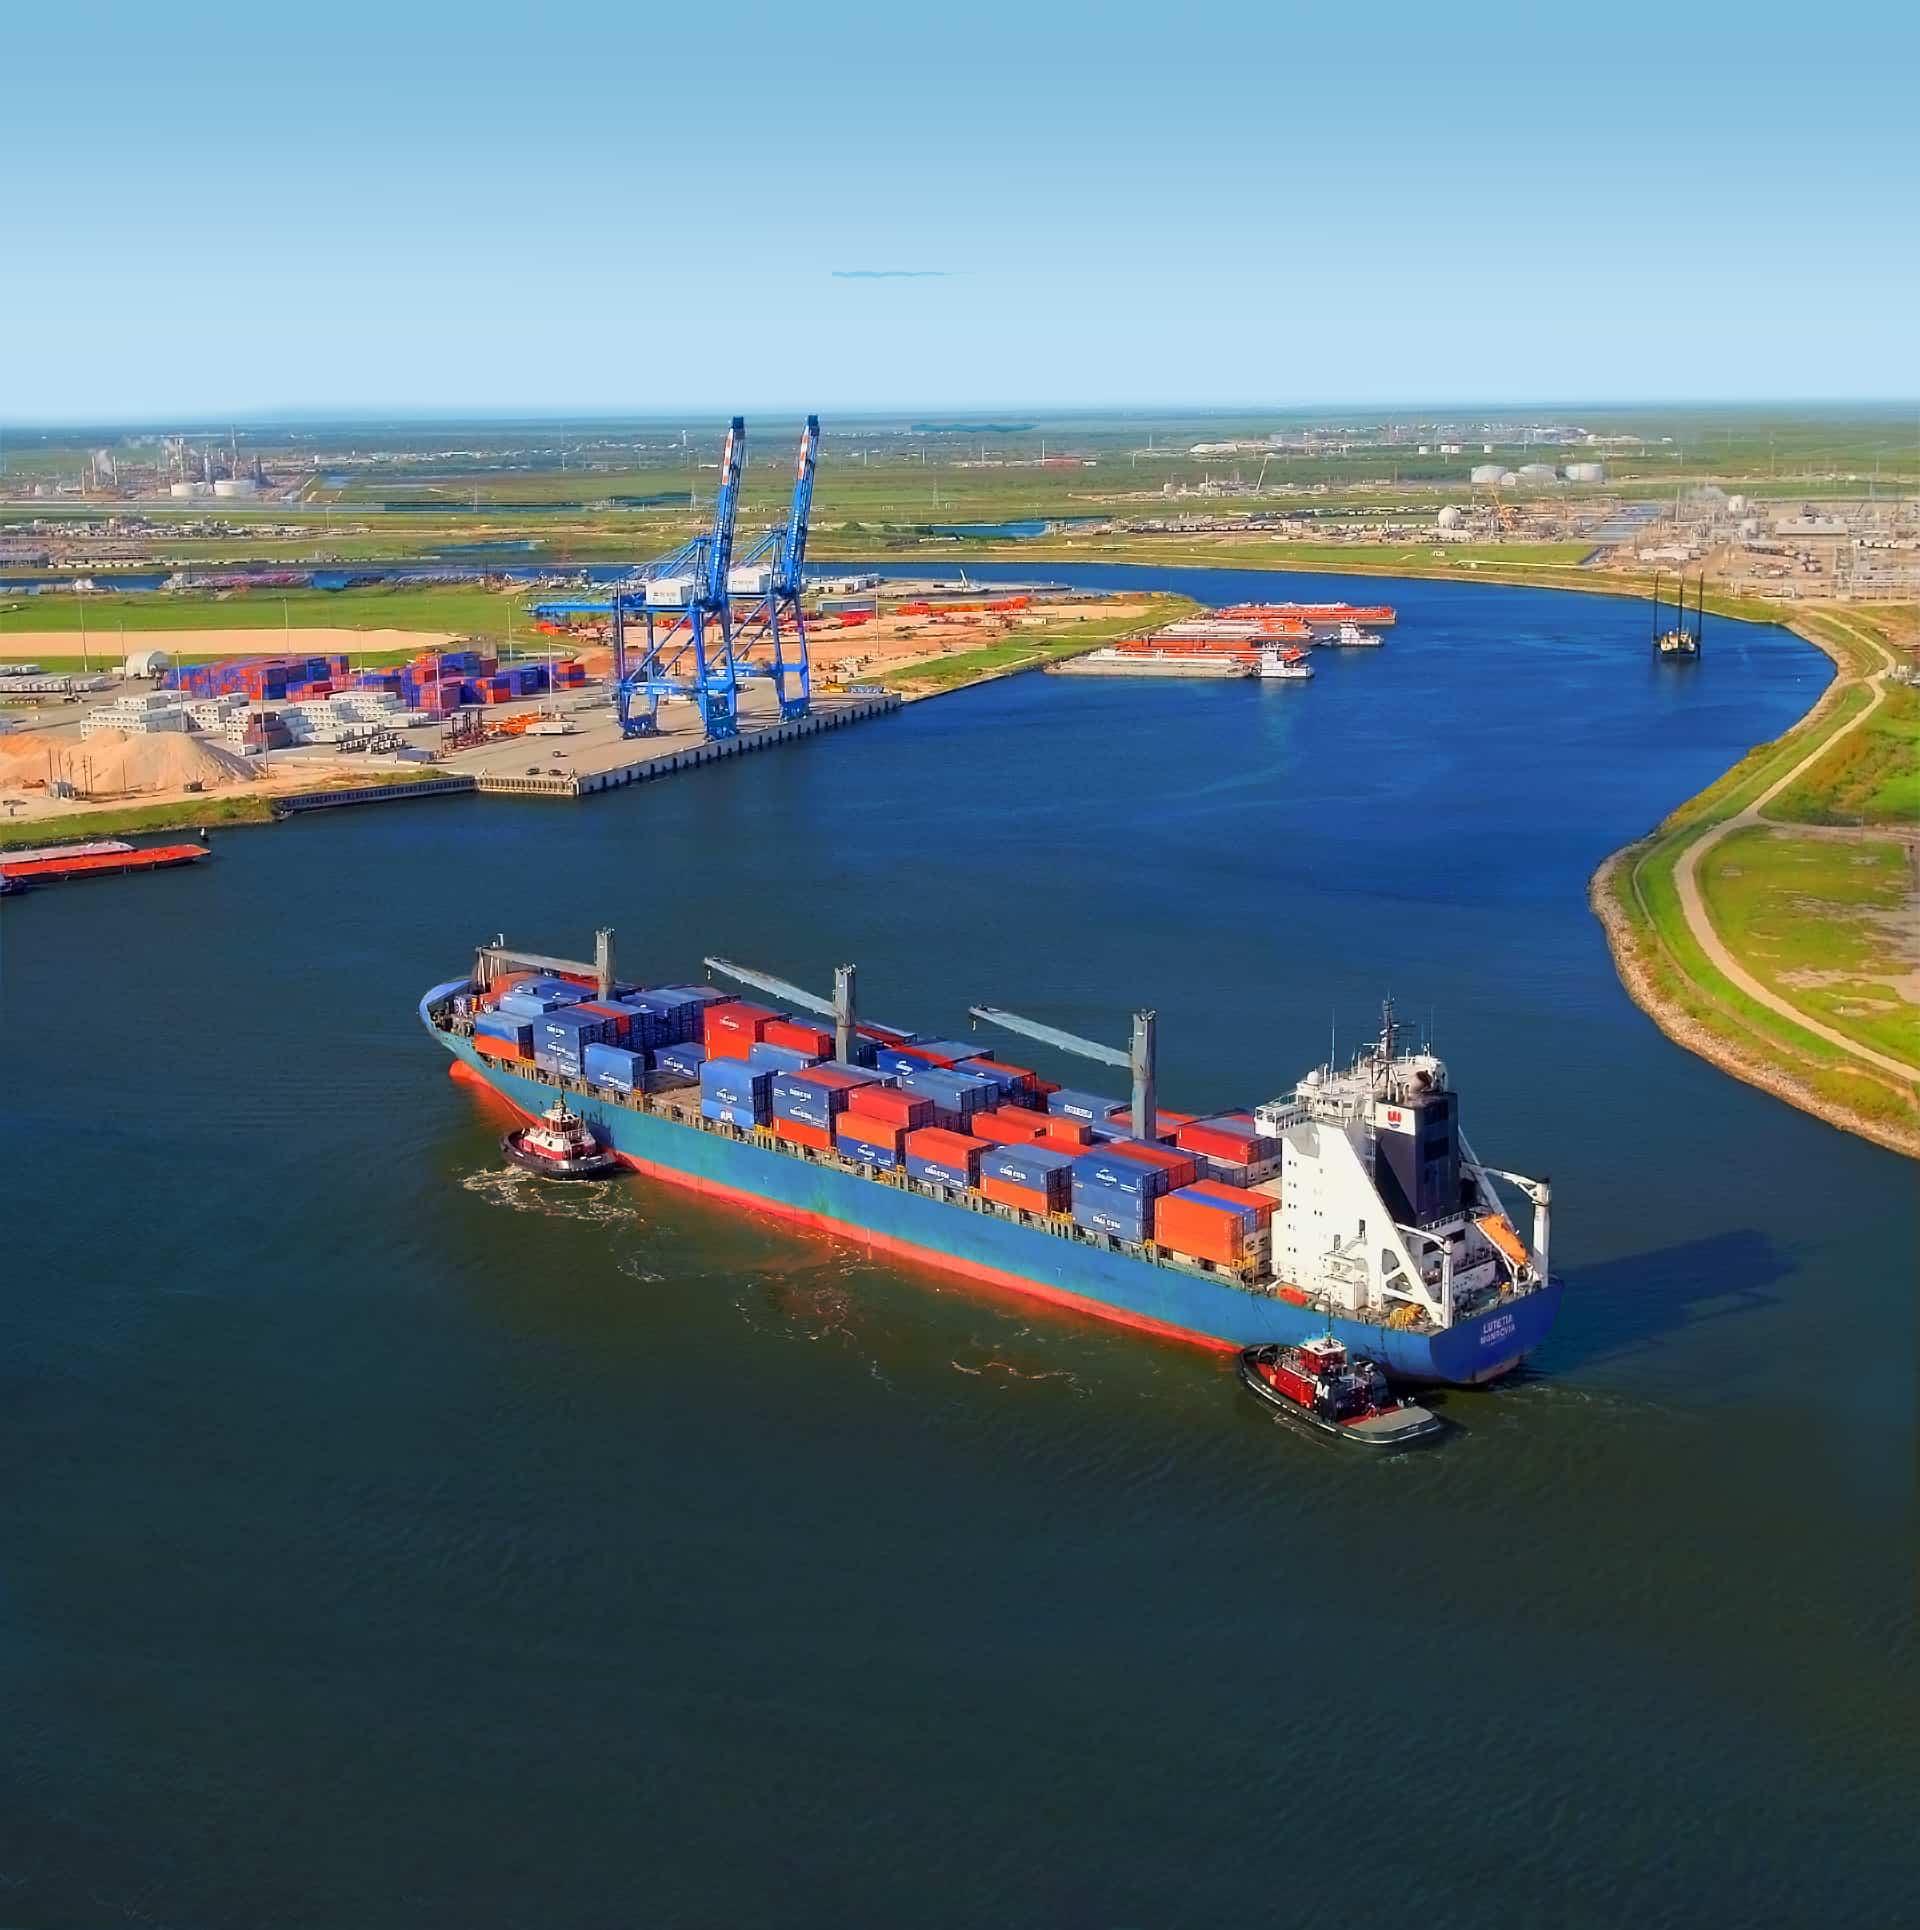 port freeport video